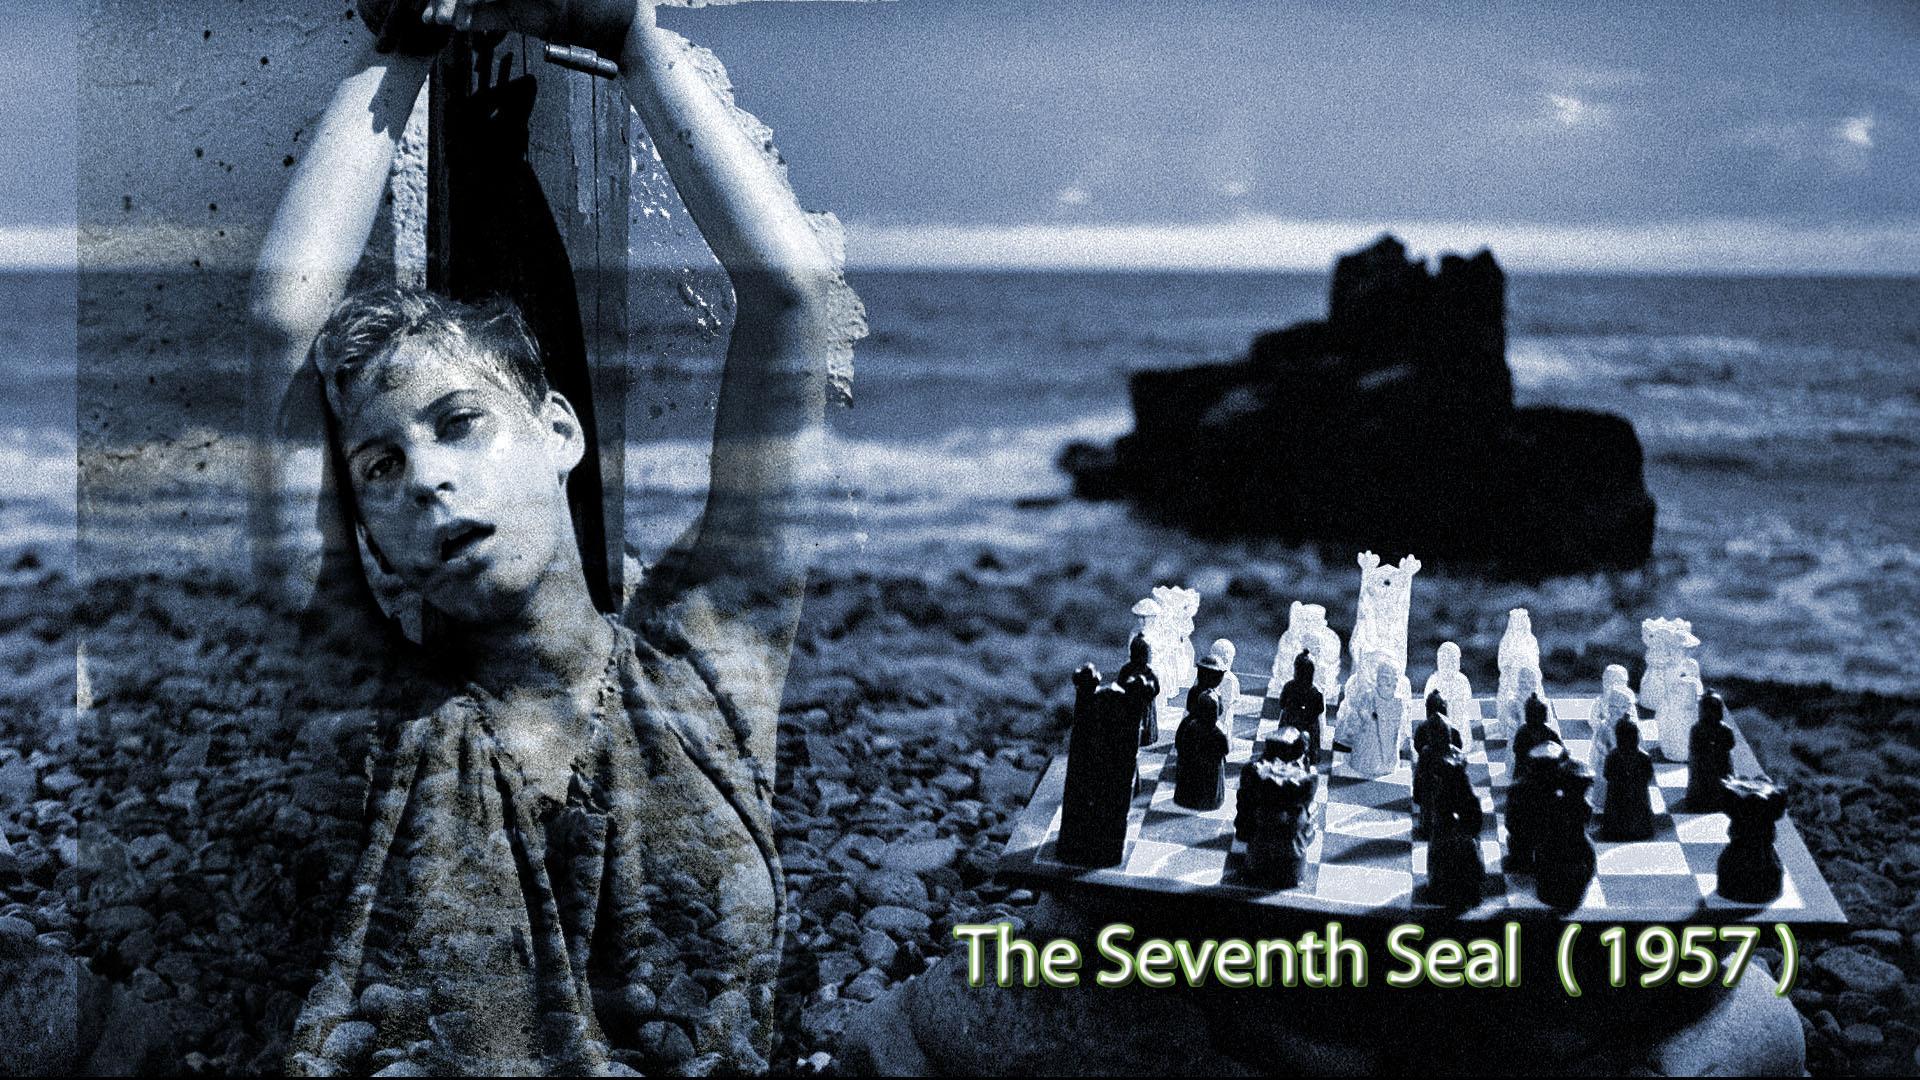 The Seventh foca, selo 1957